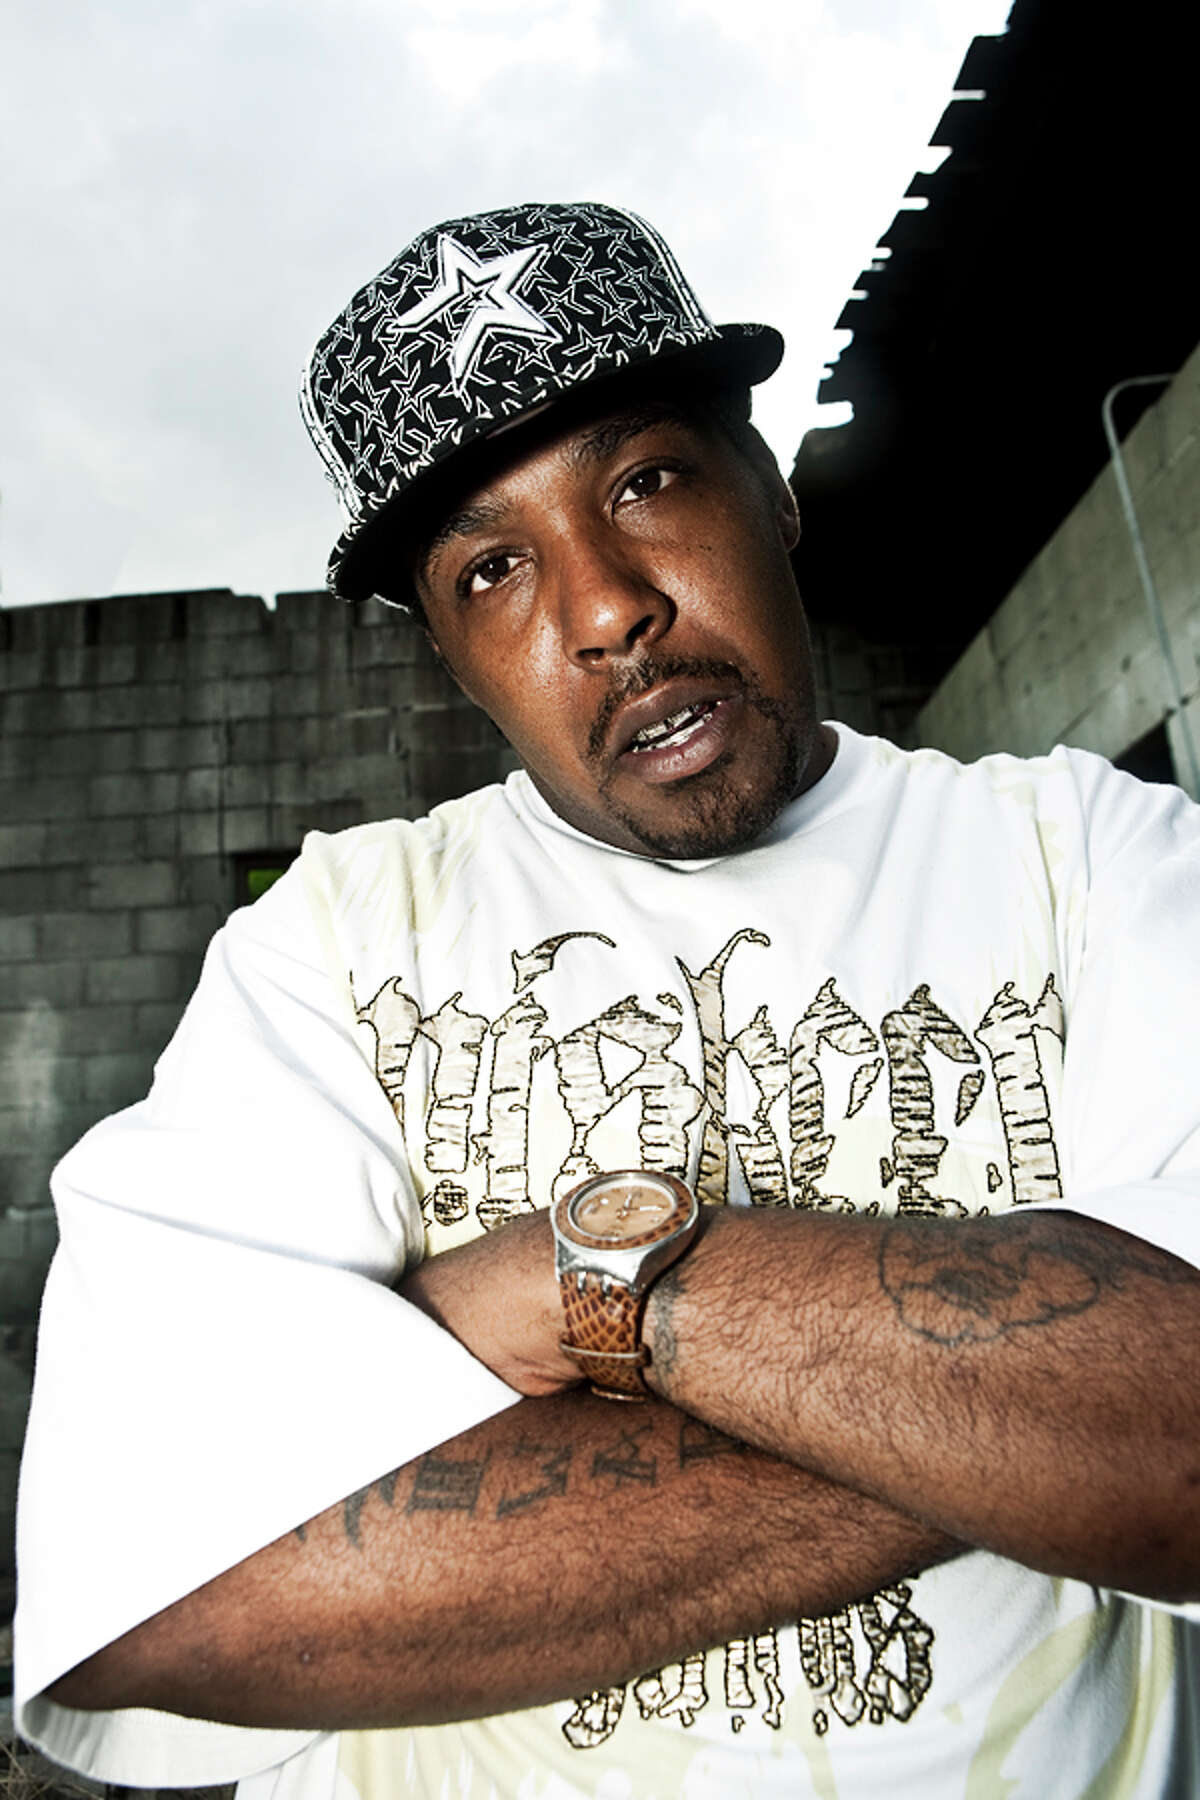 Houston rapper Mike-D (aka Bosshog Corleone) was influenced by the late DJ Screw.